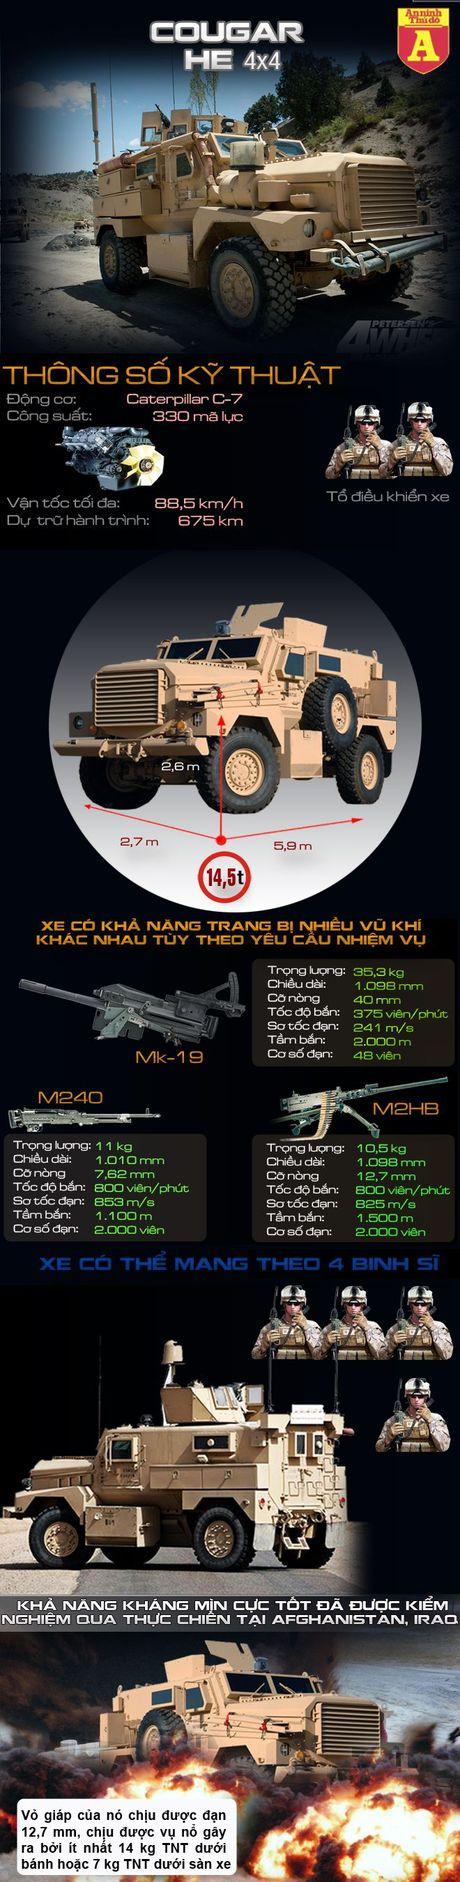 Ung cu vien thay the xe UAZ-469 cua Viet Nam - Anh 2